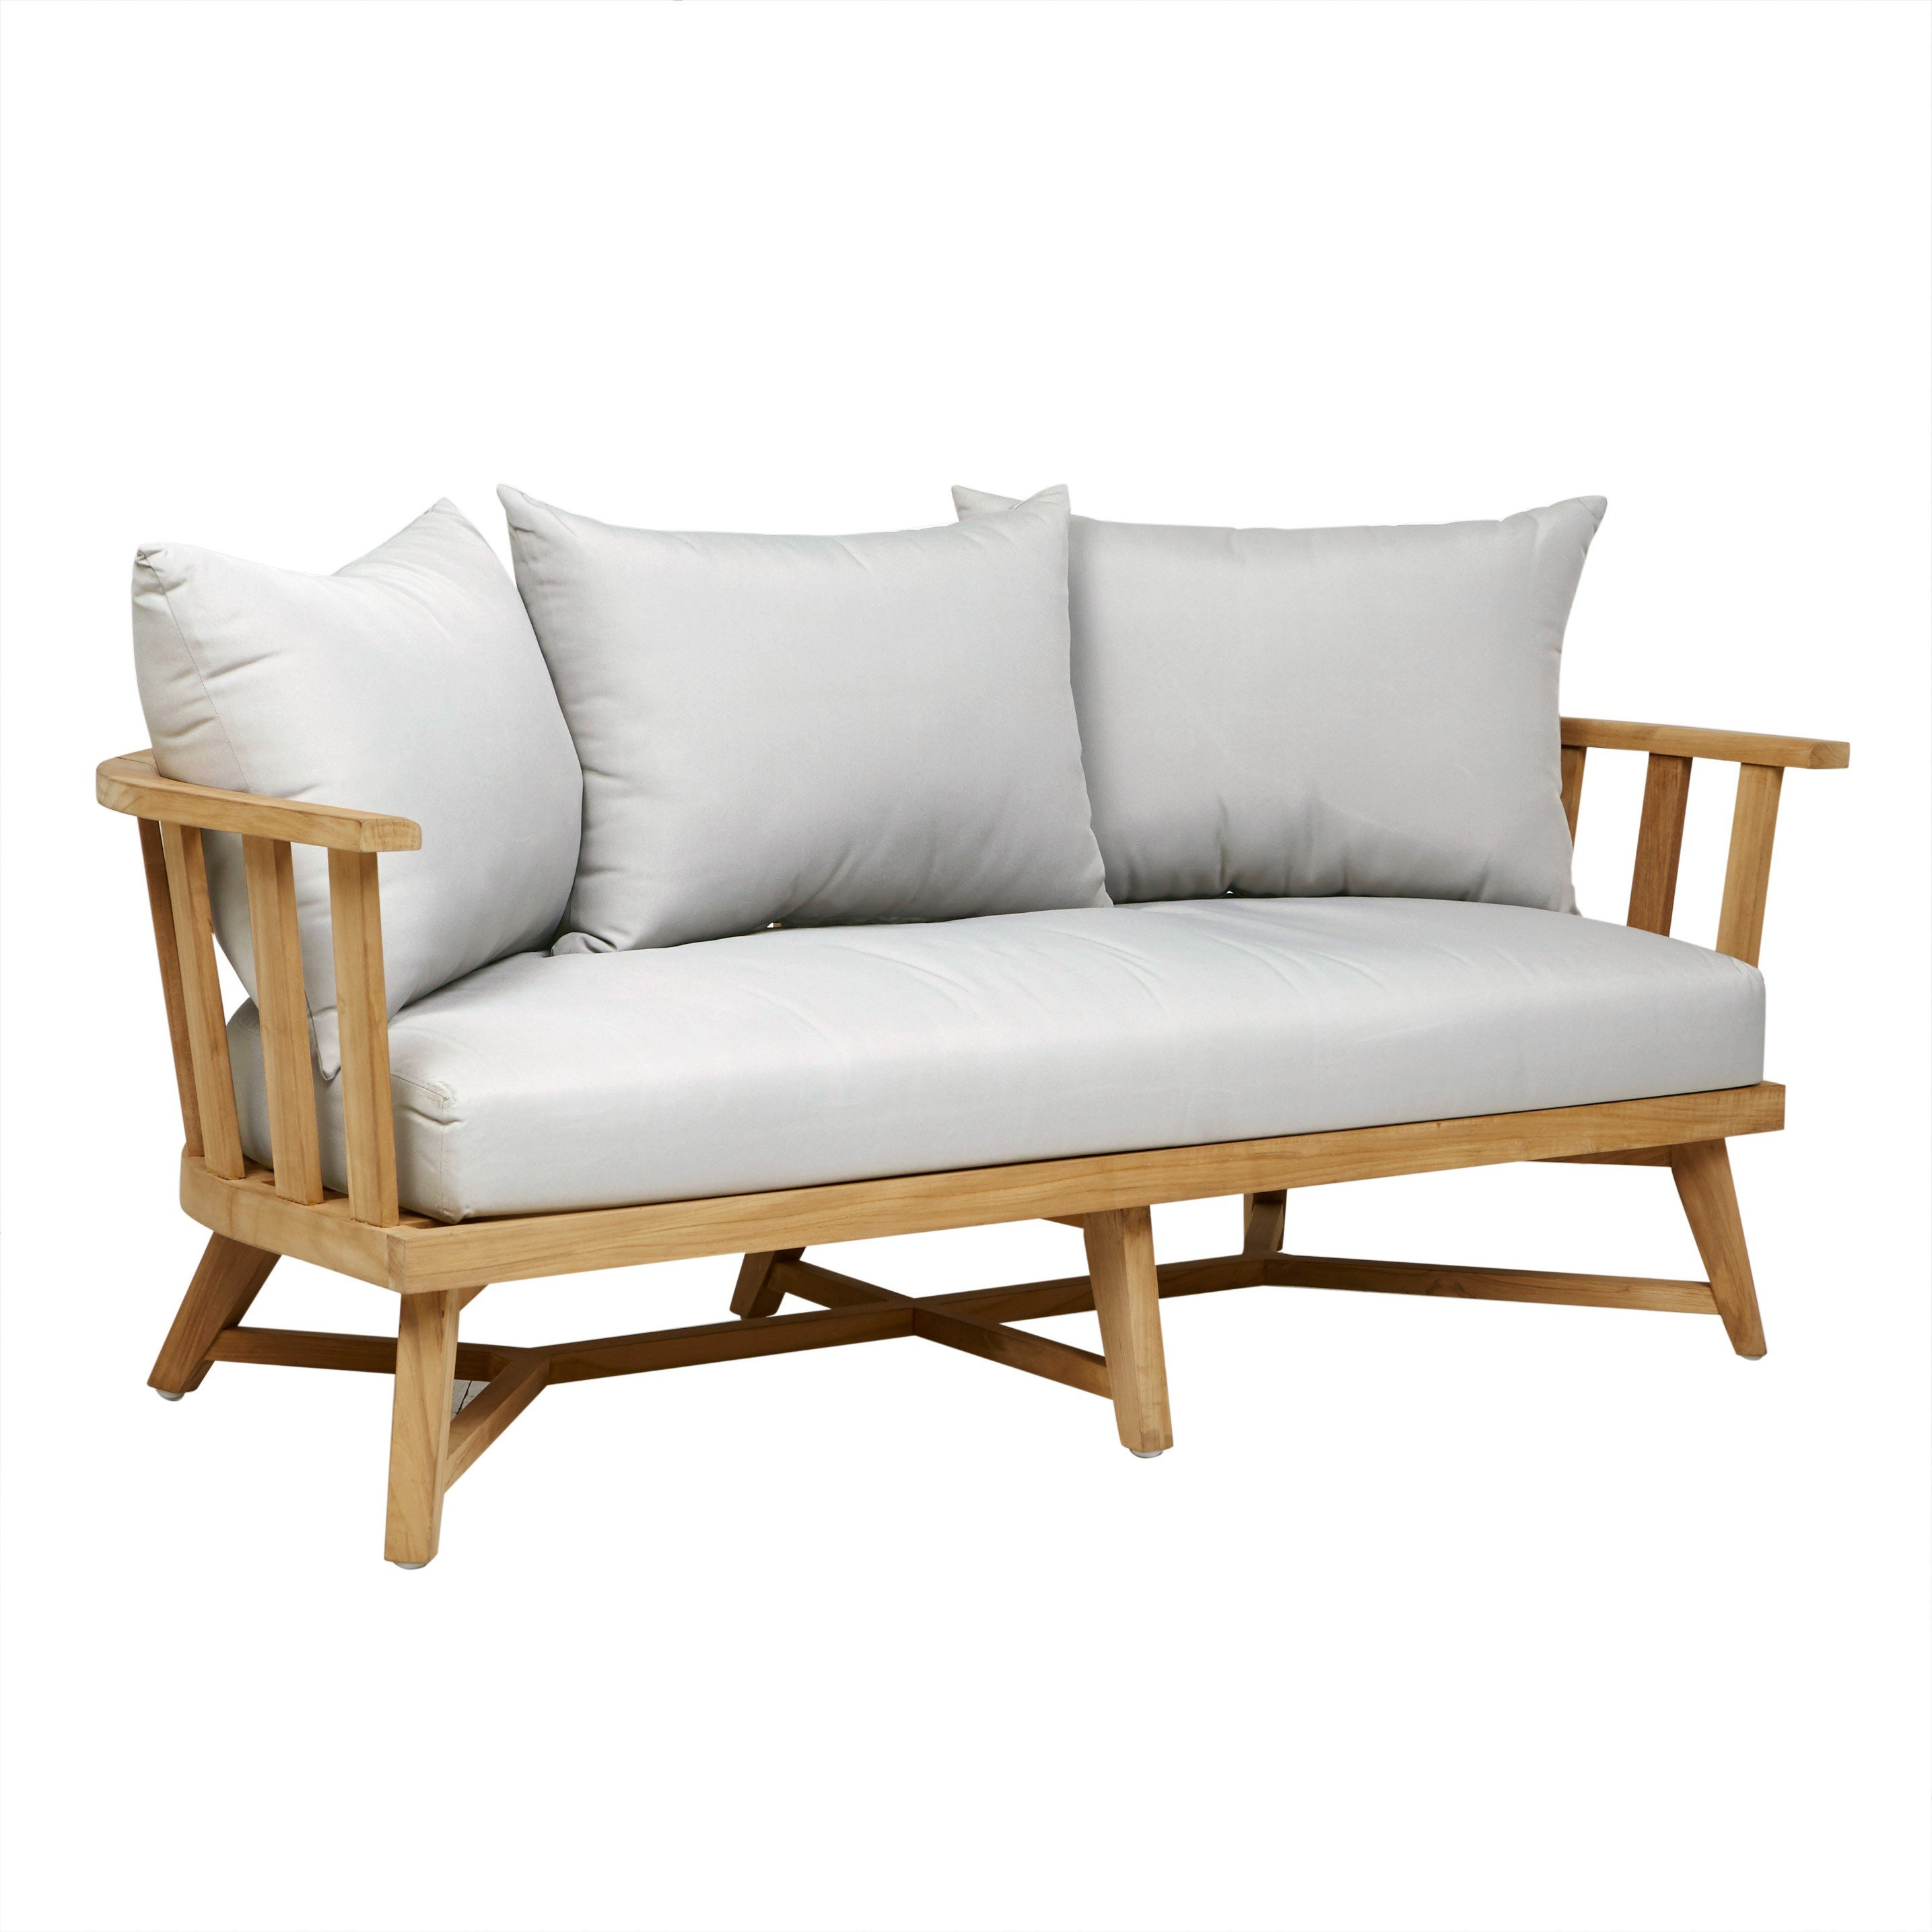 Furniture Hero-Images Sofas sonoma-slat-three-seater-01